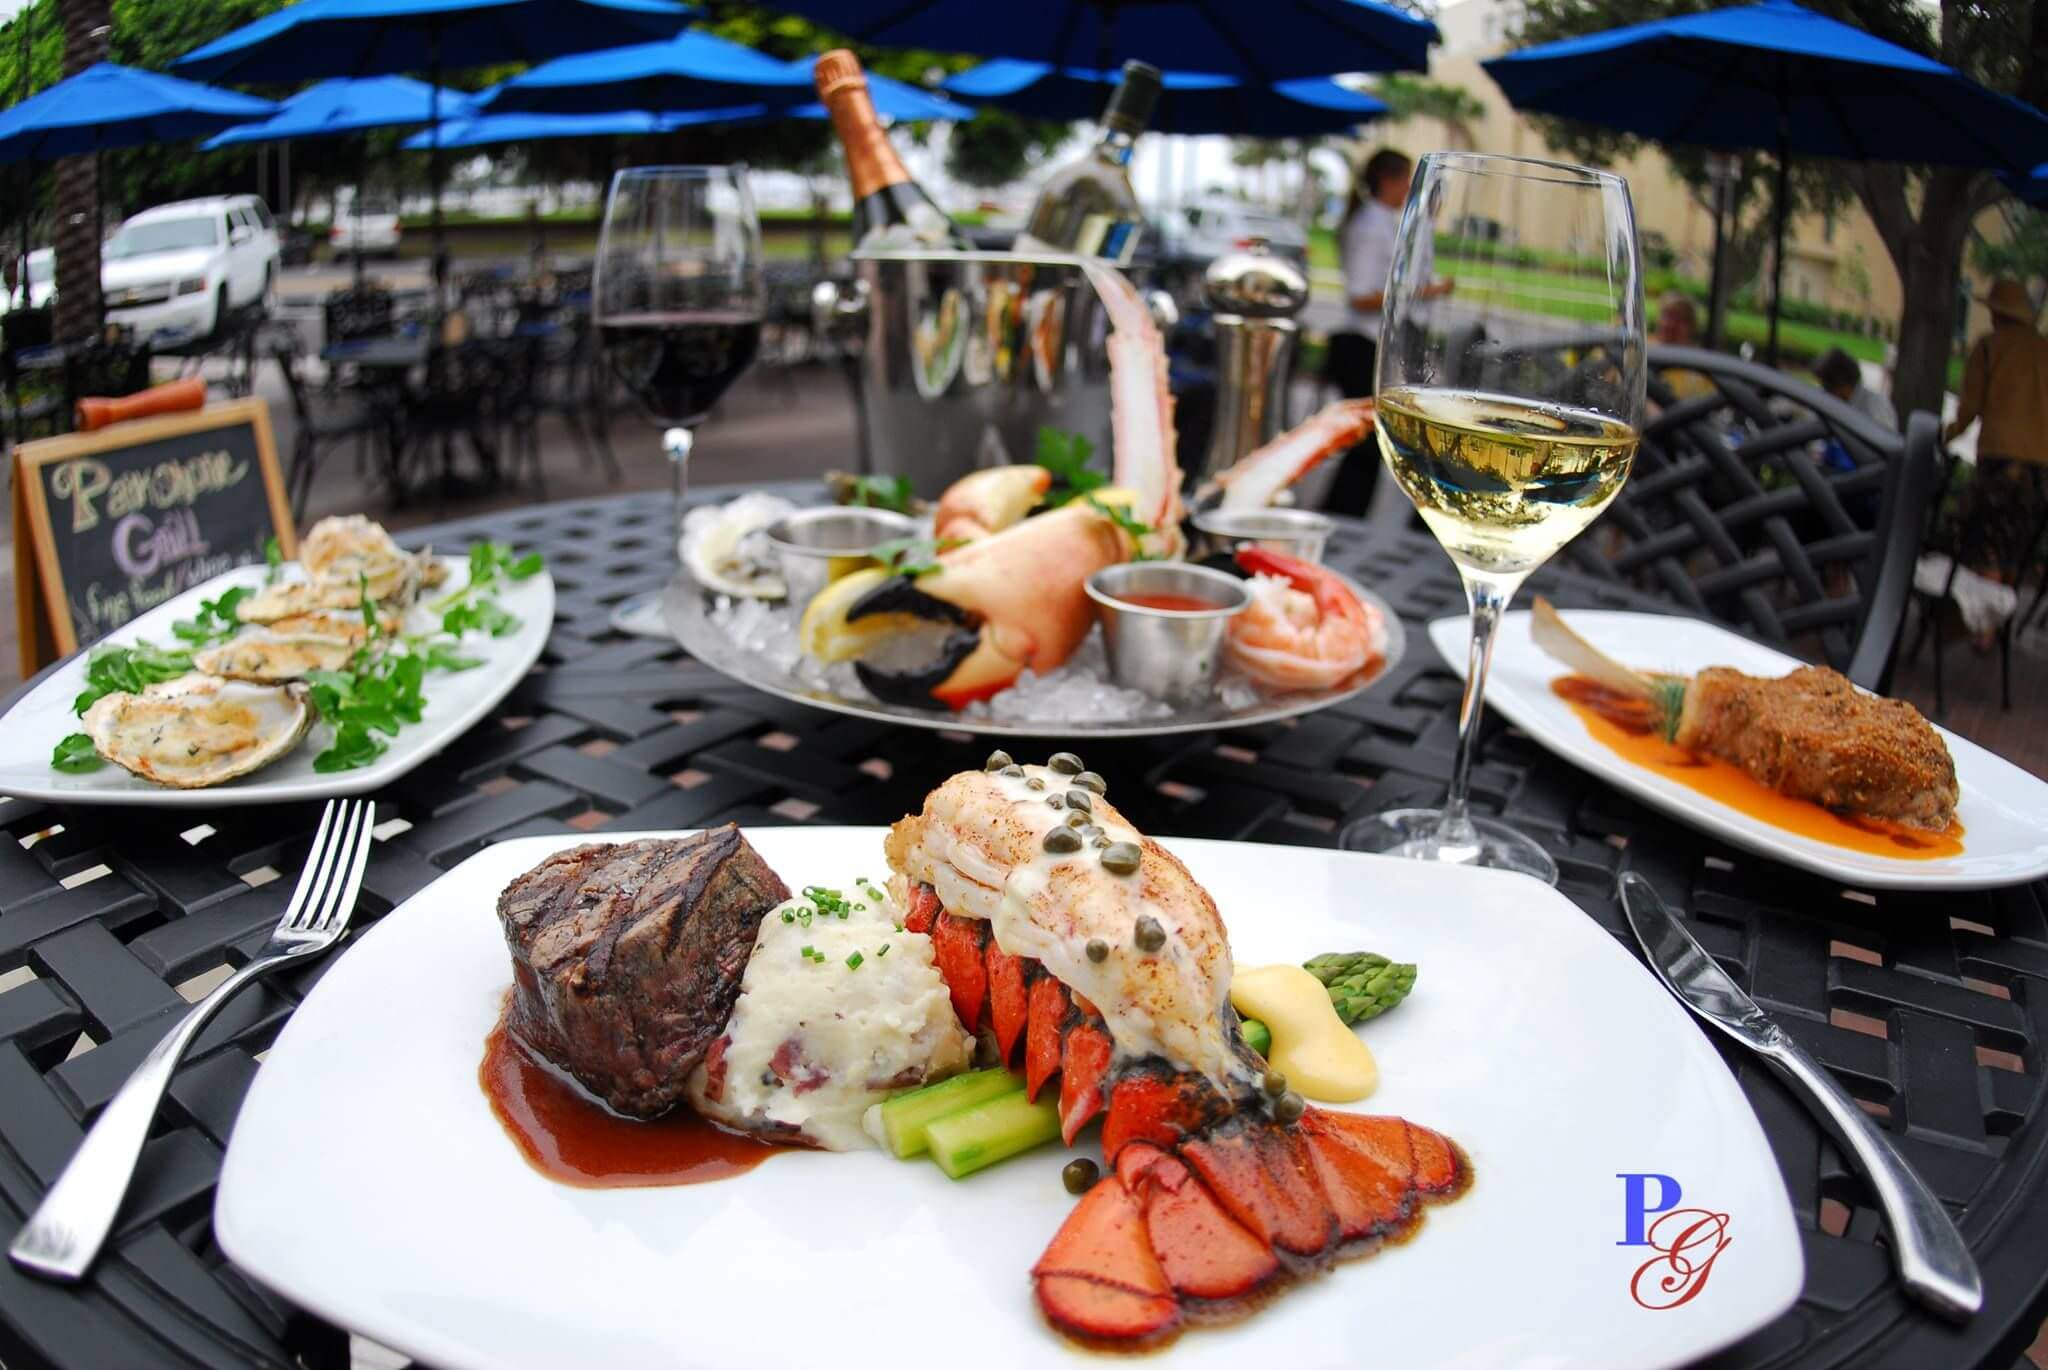 Comida no restaurante Parkshore Grill